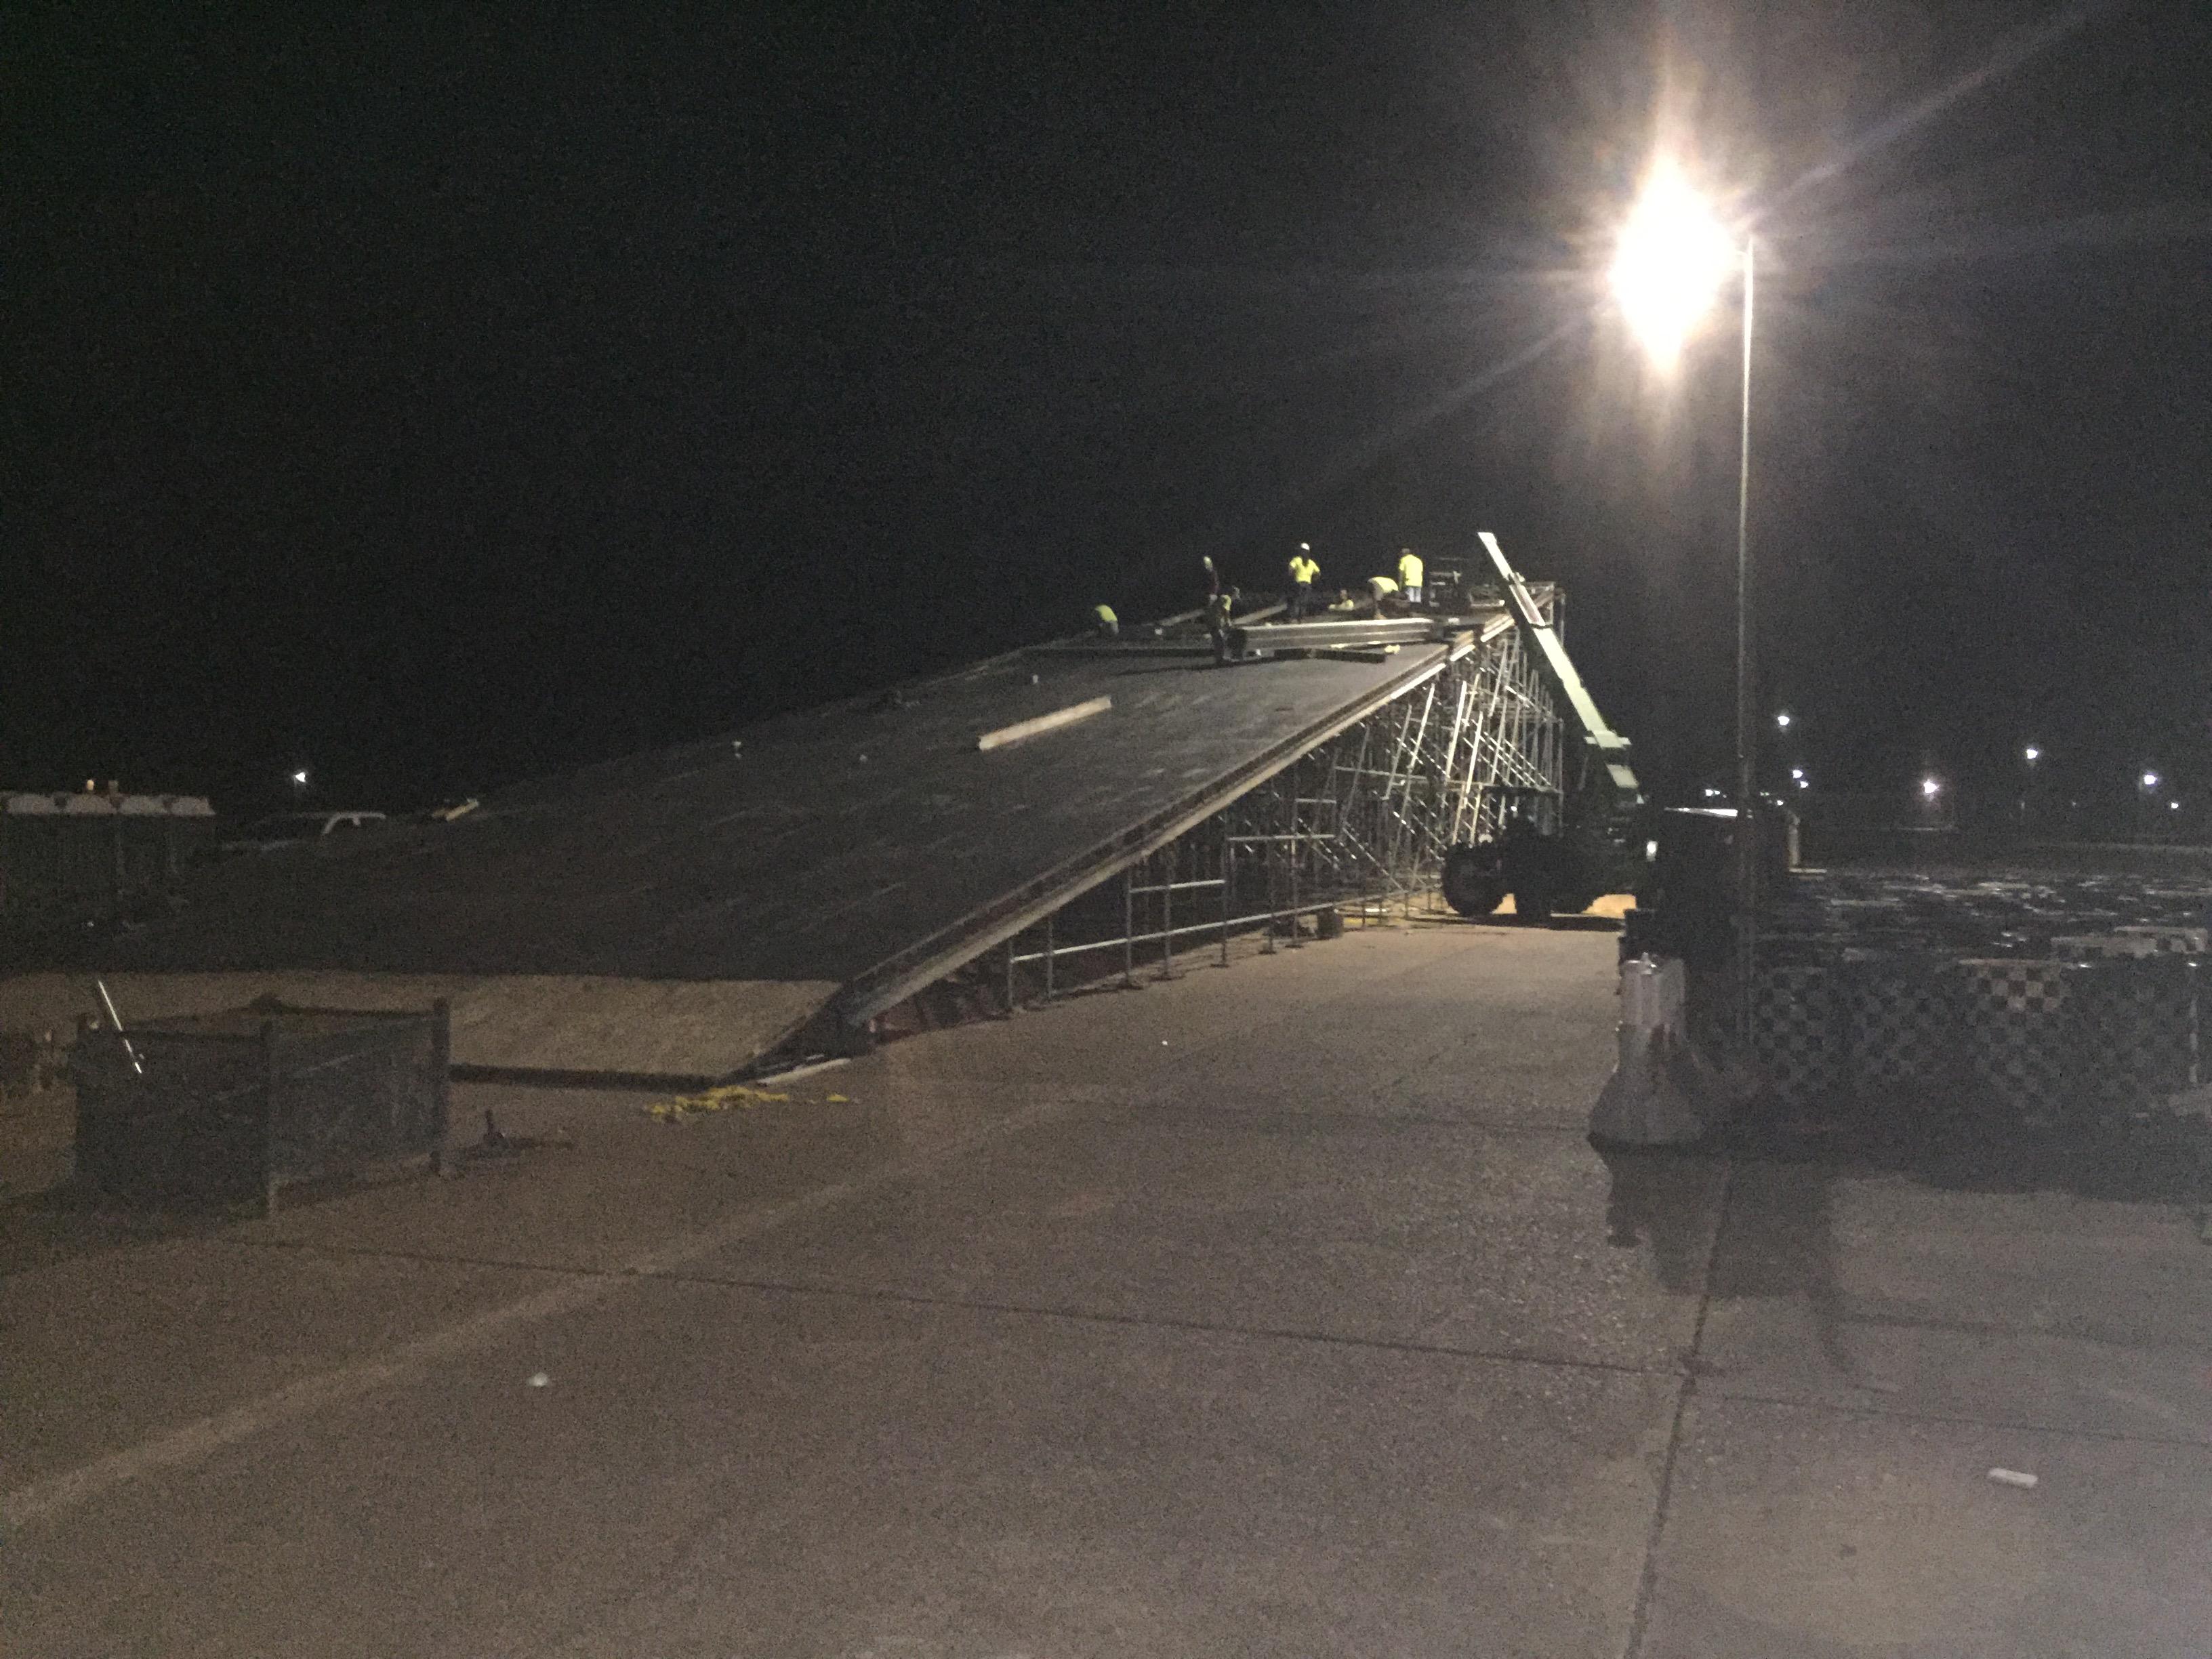 Talledega Superspeedway scaffold motorcycle ramp 3